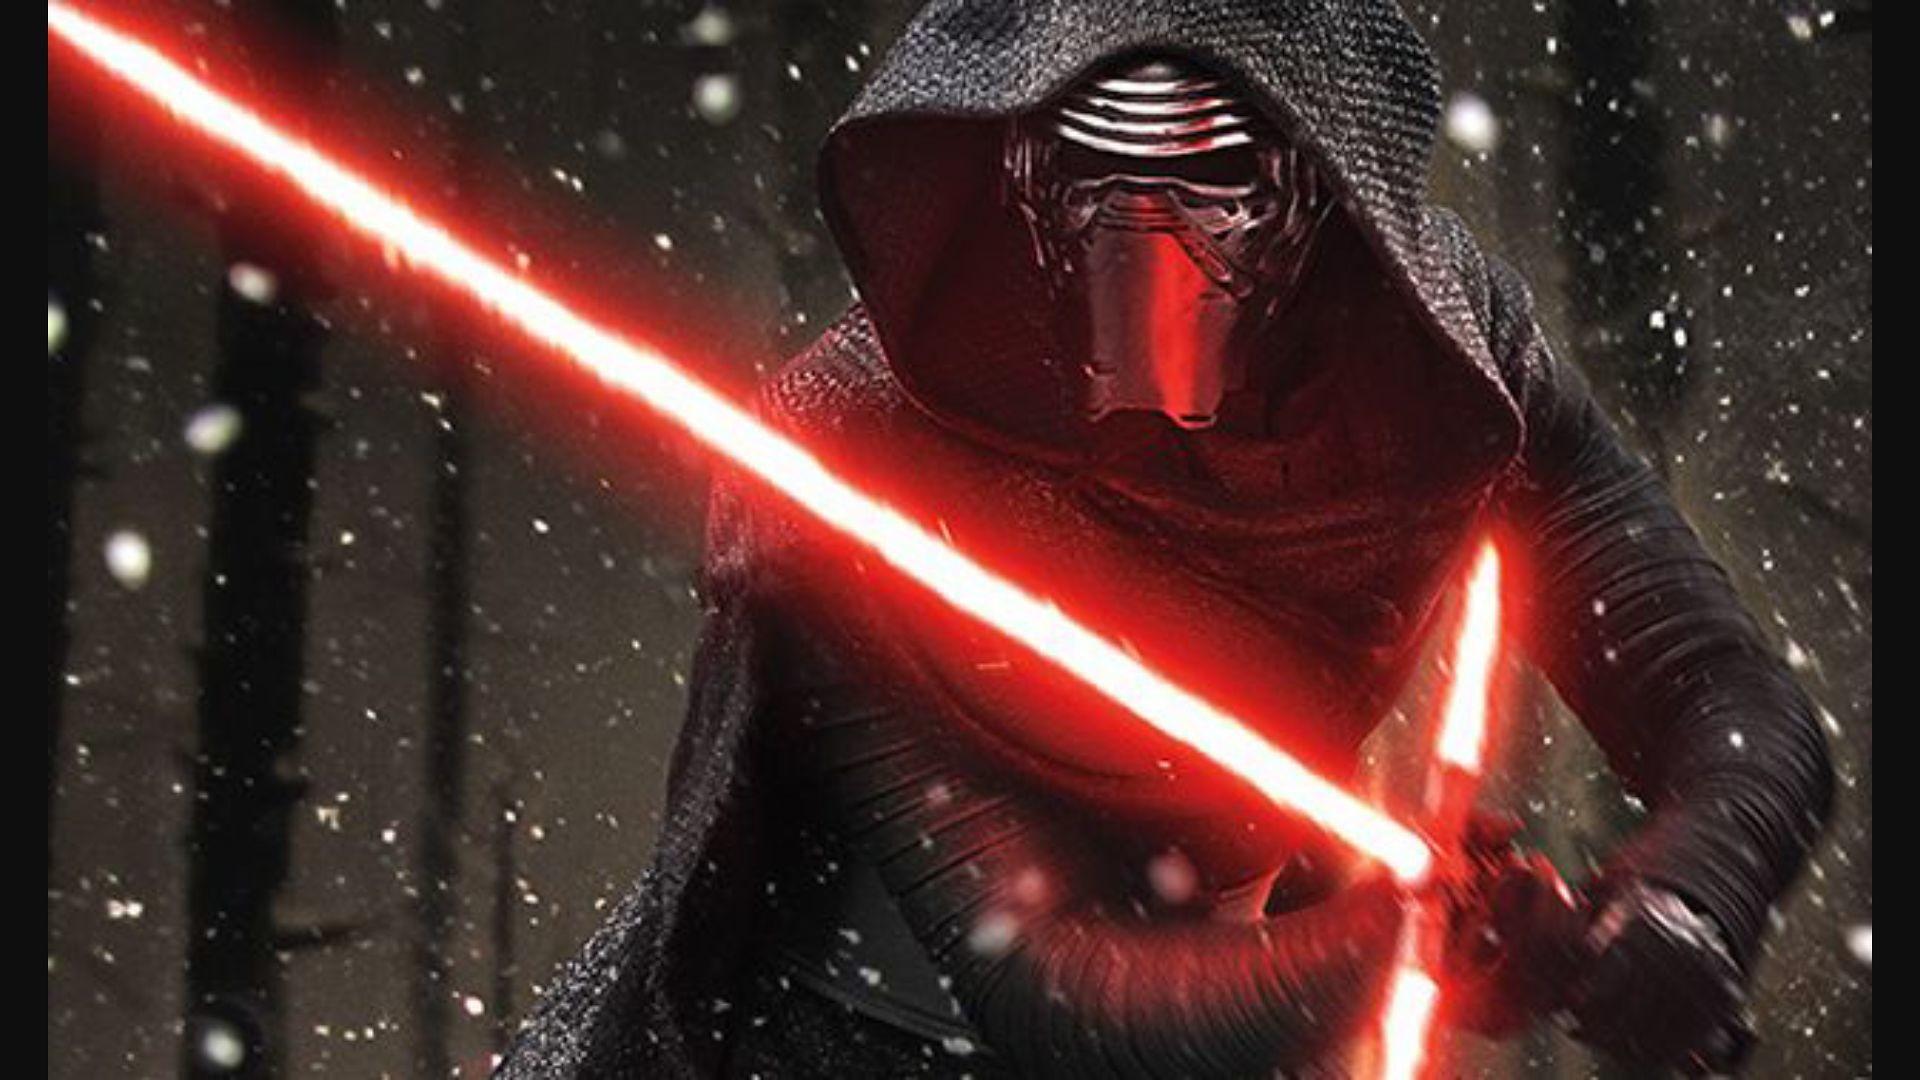 Kylo-Ren-Had-To-Spoiler-In-The-Force-Awakens-Star-Wars-The .